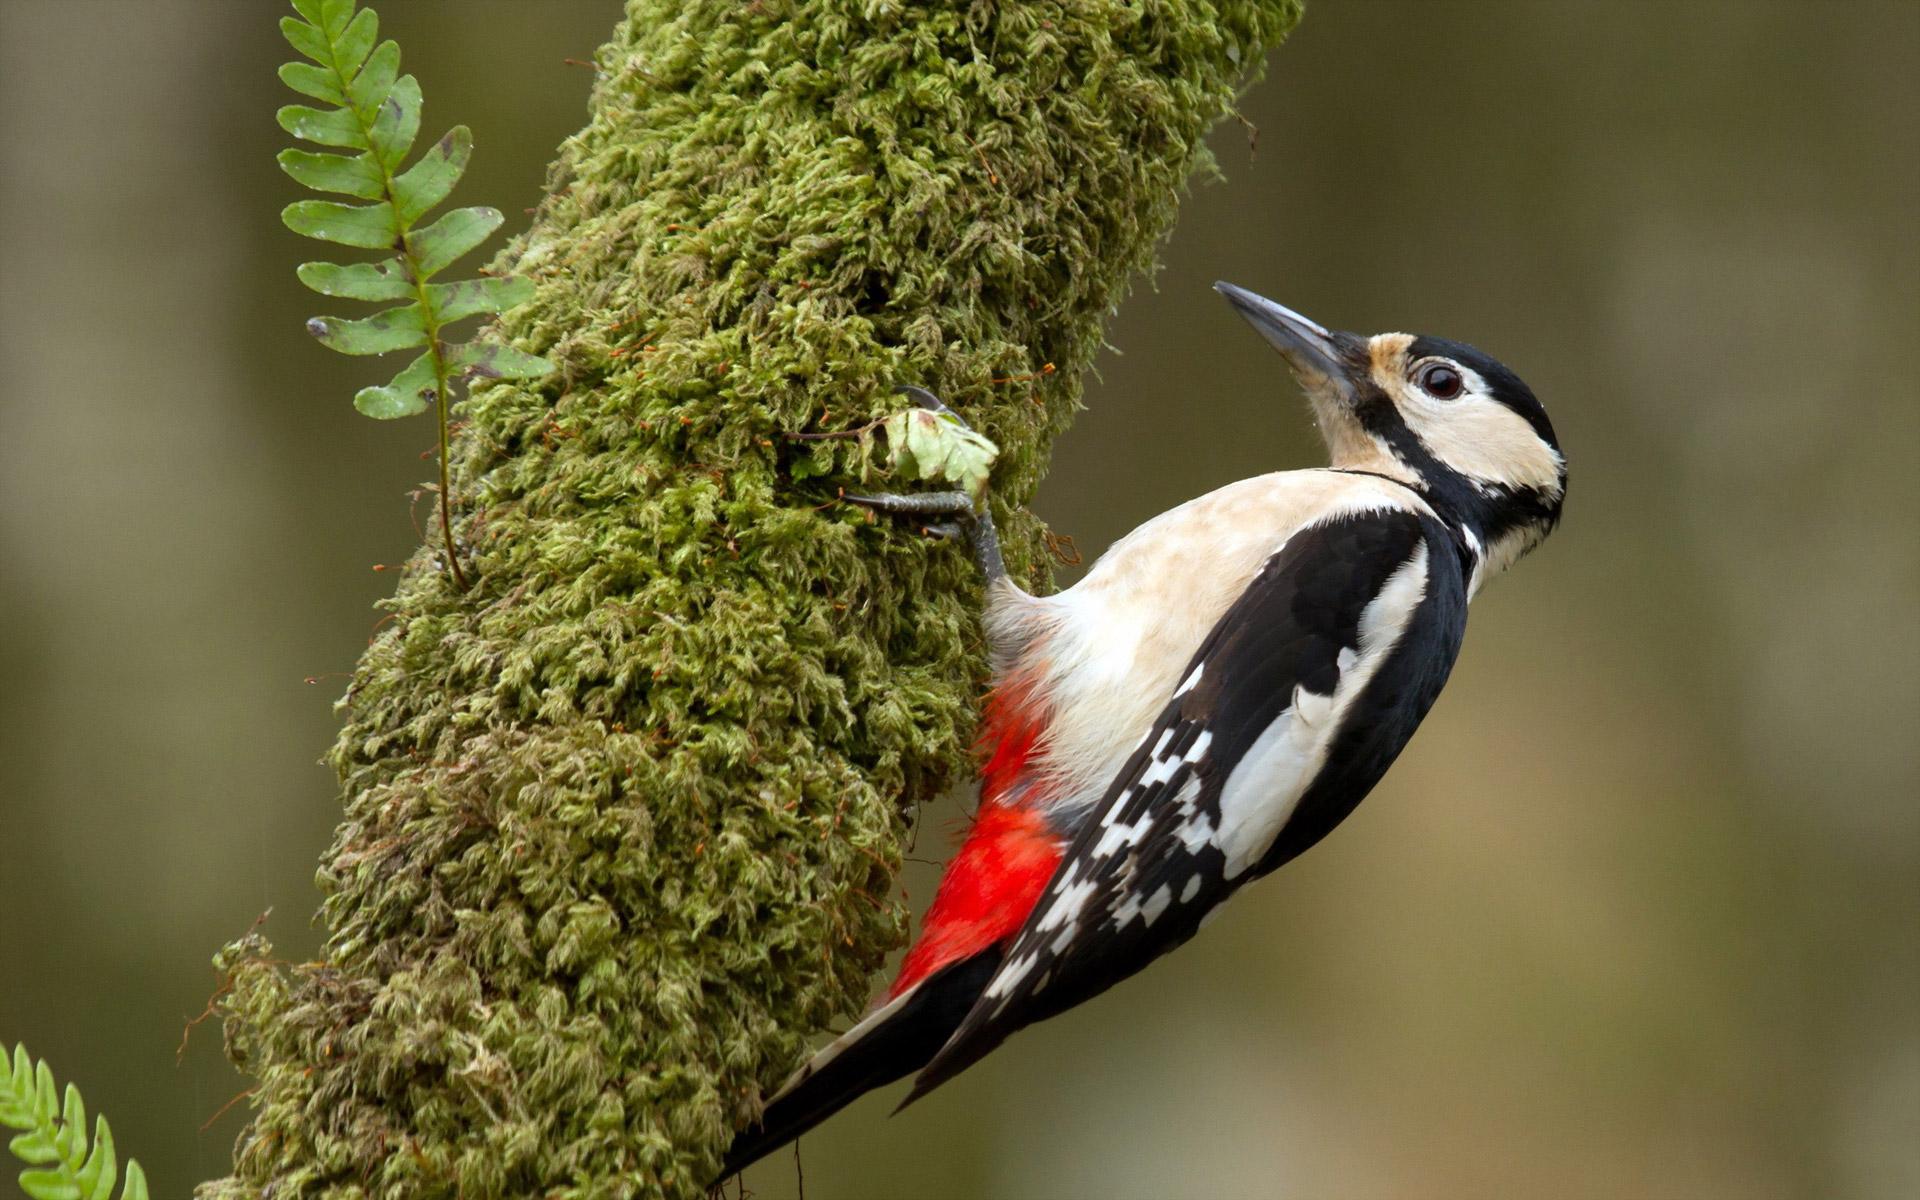 Paul George Wallpaper Hd Woodpecker Bird Wallpapers Archives Hdwallsource Com